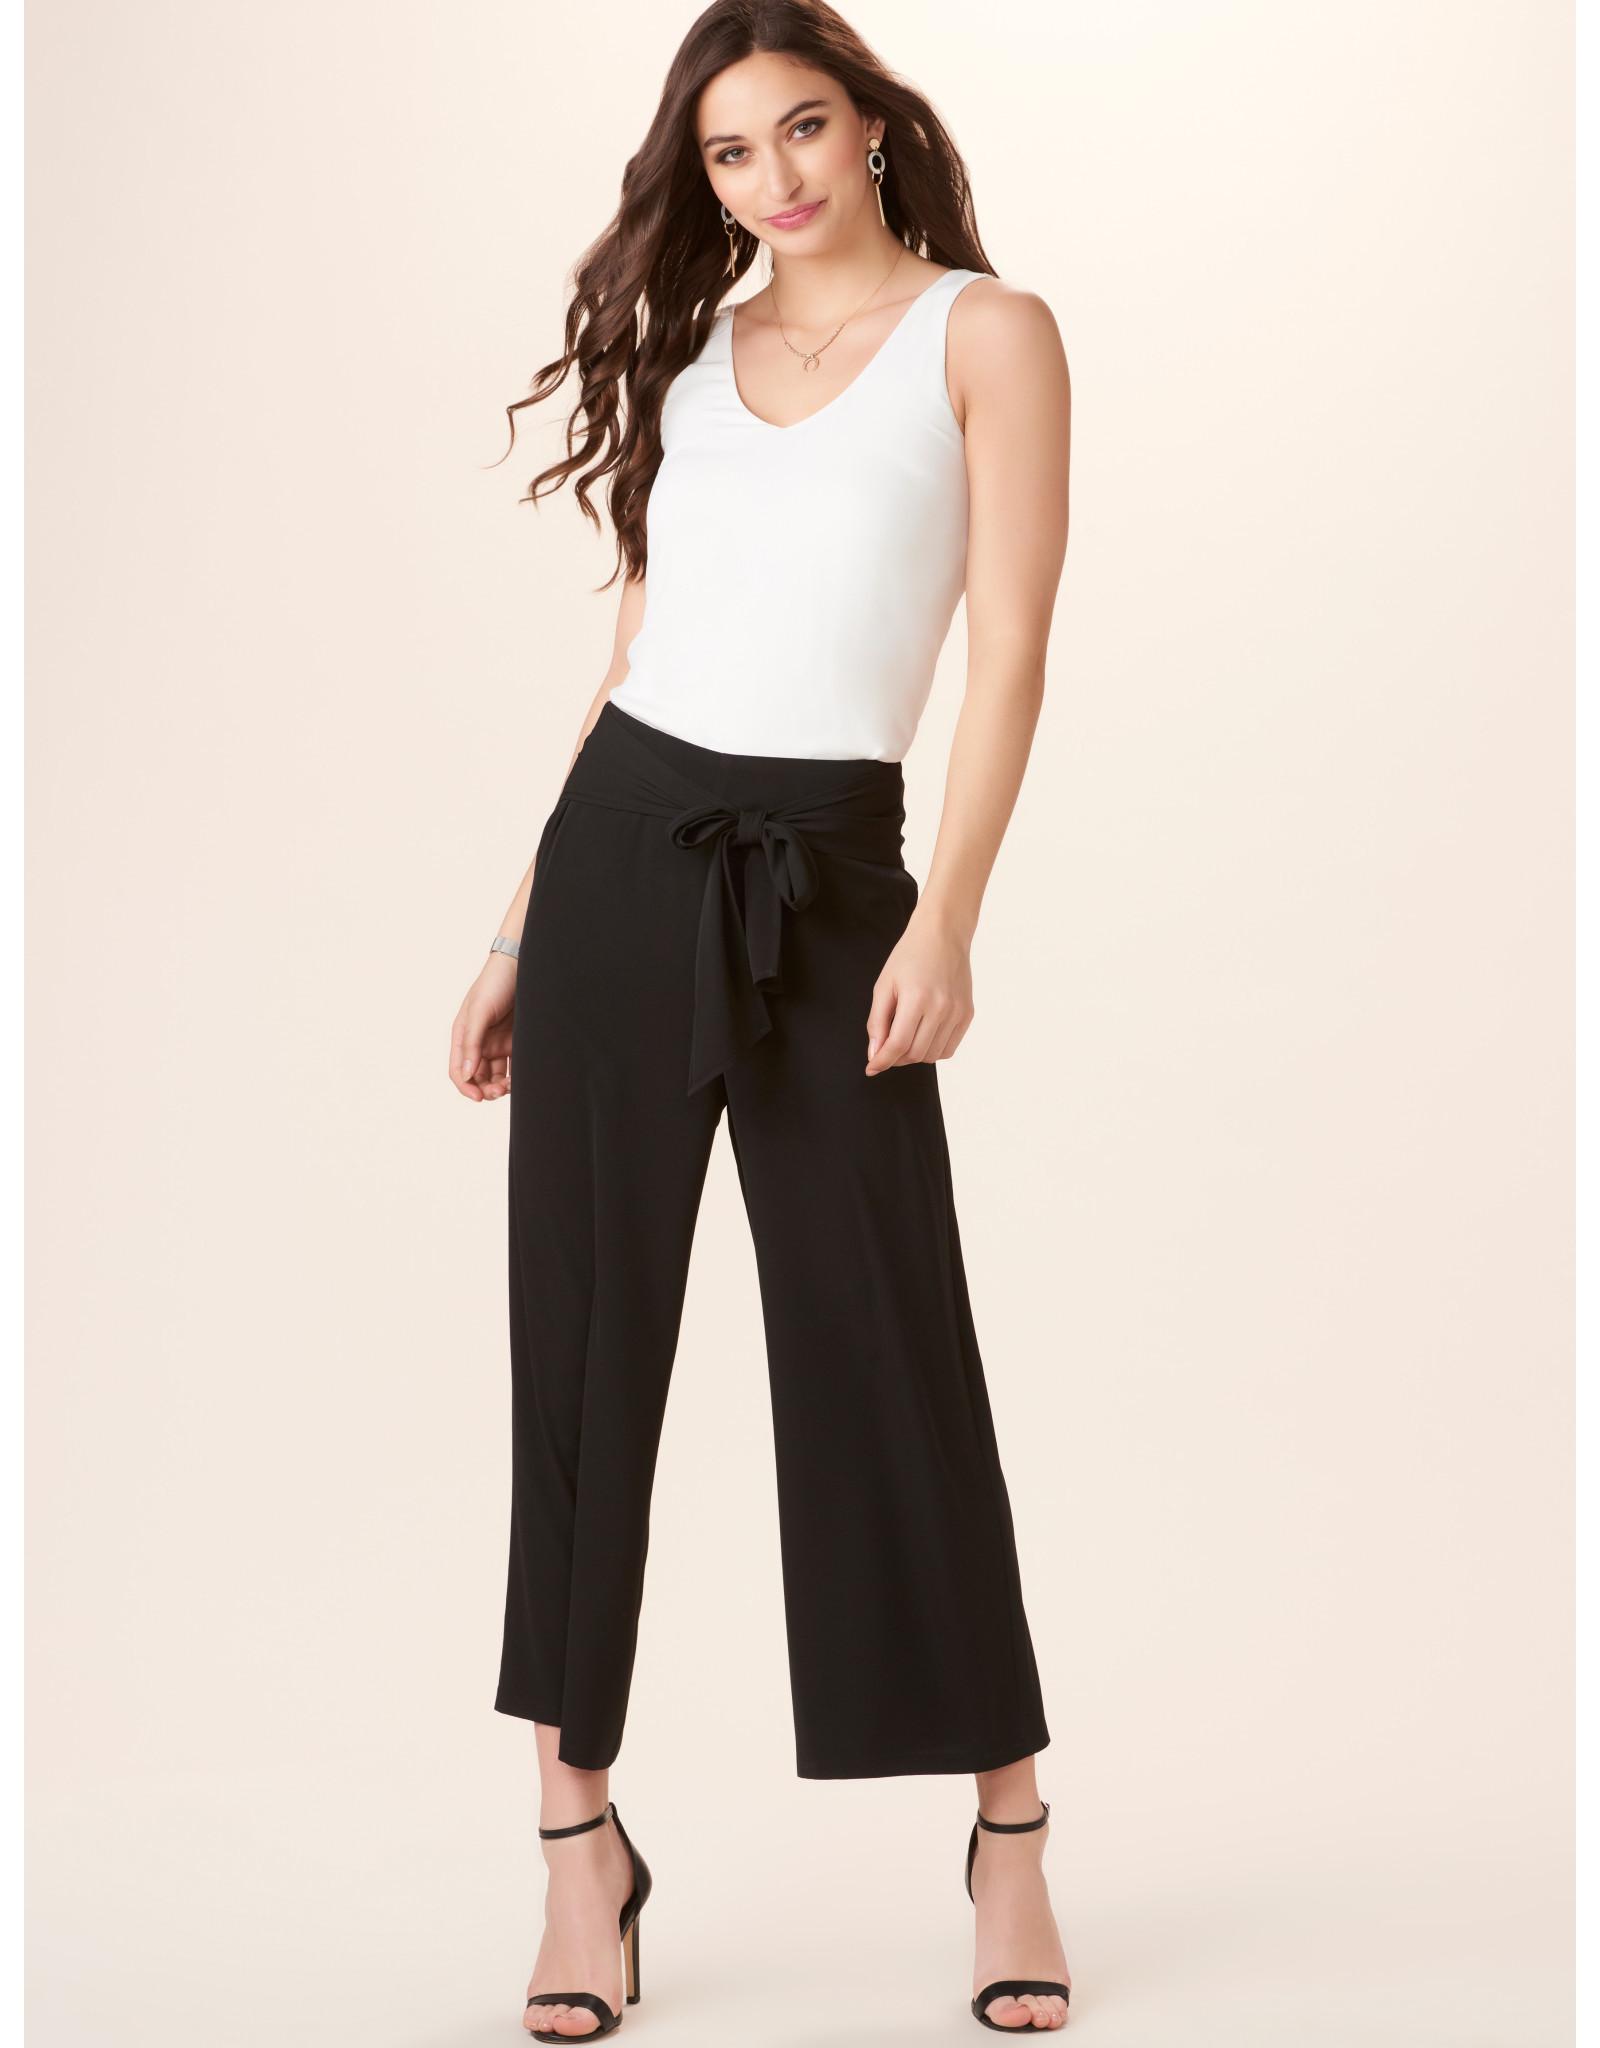 TLC DRESS PANT